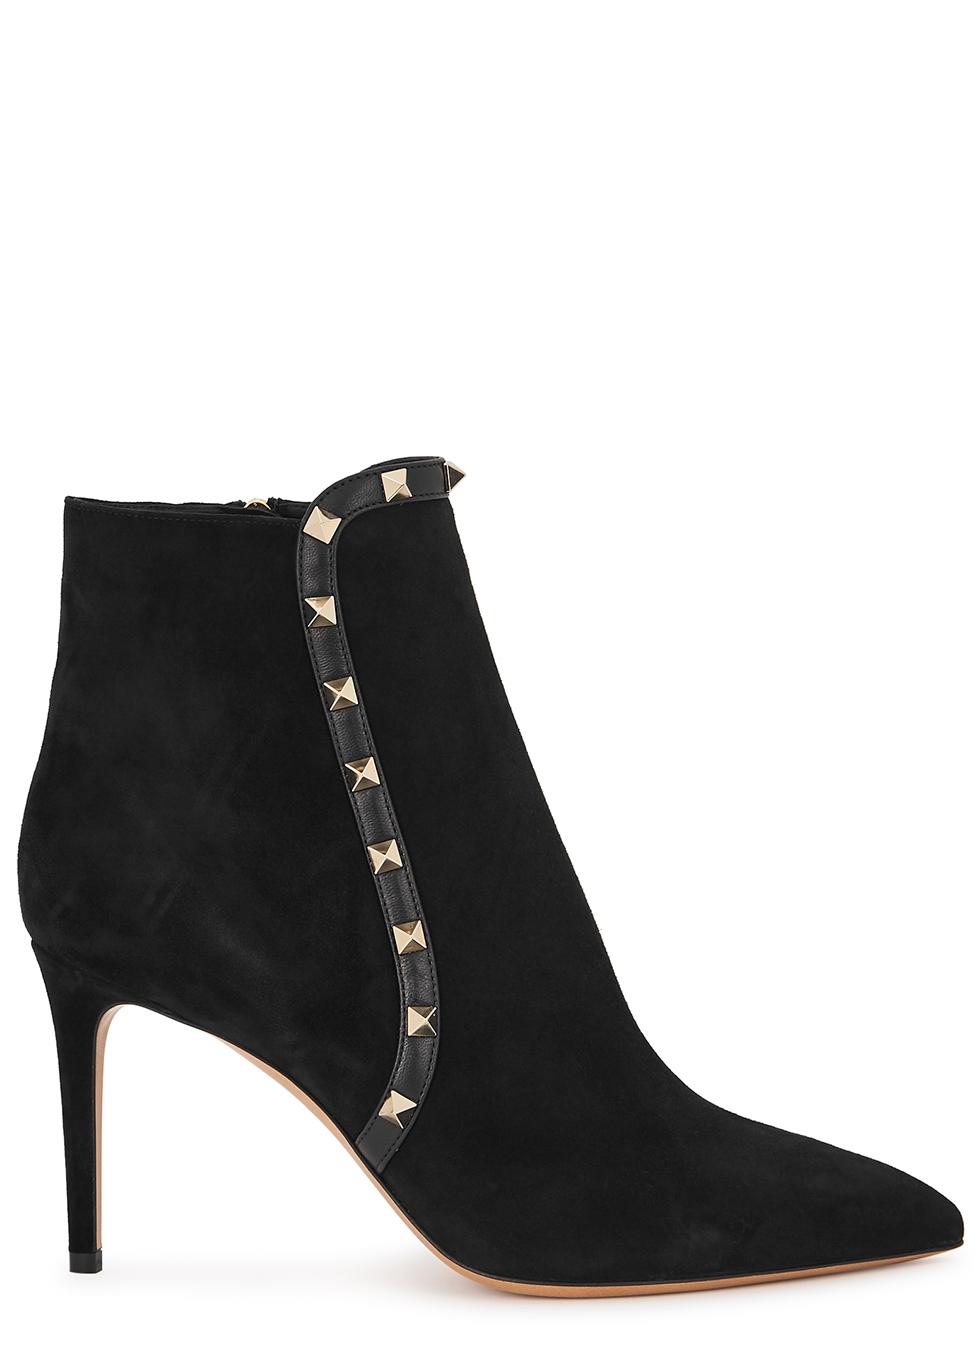 Valentino Garavani Rockstud 85 black suede ankle boots